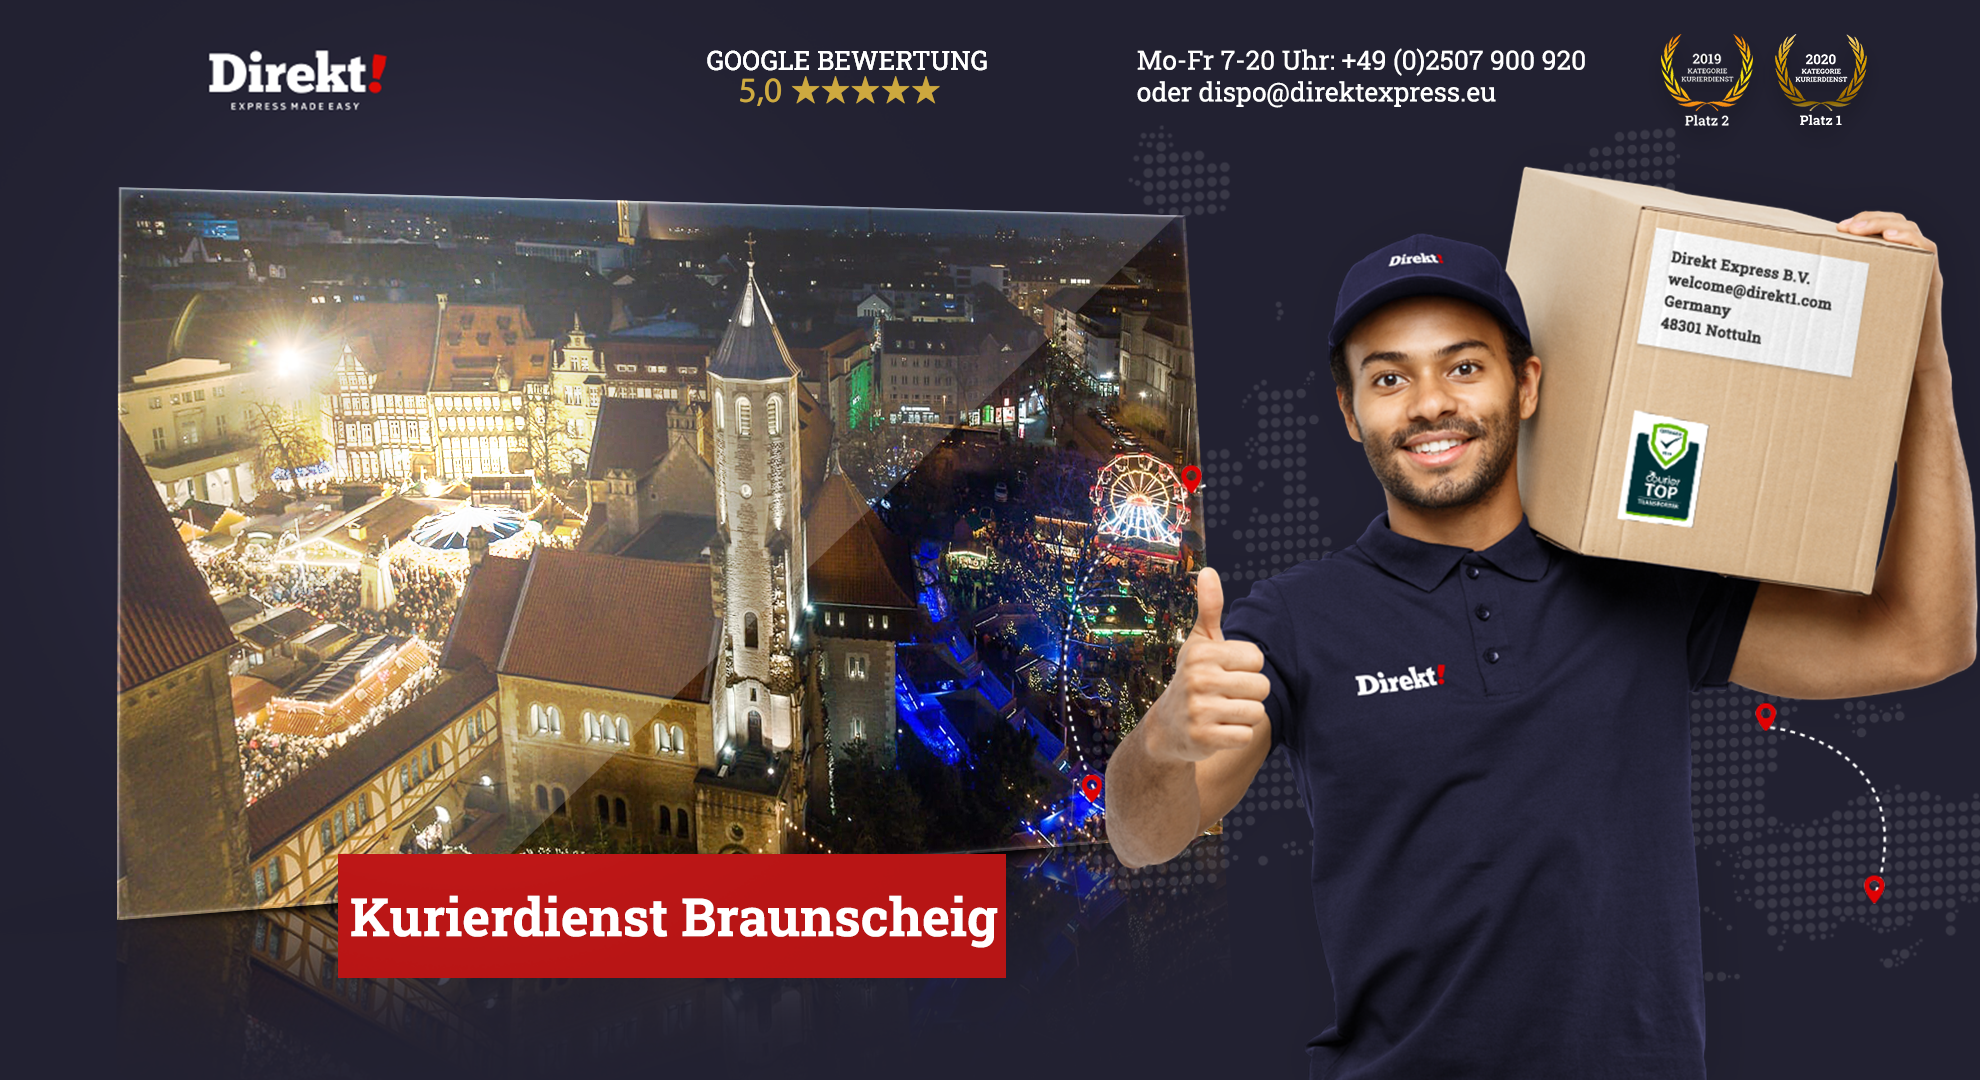 https://direkt1.com/wp-content/uploads/2021/05/Kurierdienst-braunschweig-buchen.png